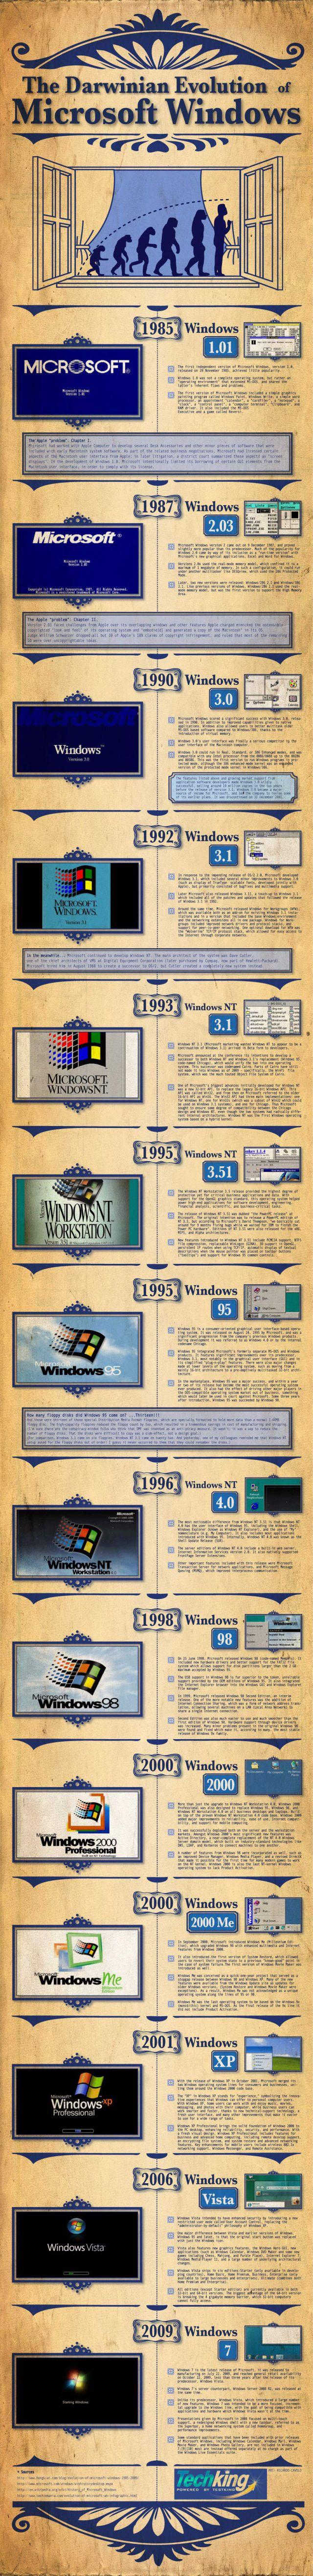 Evolution of Windows Image (1 pic)